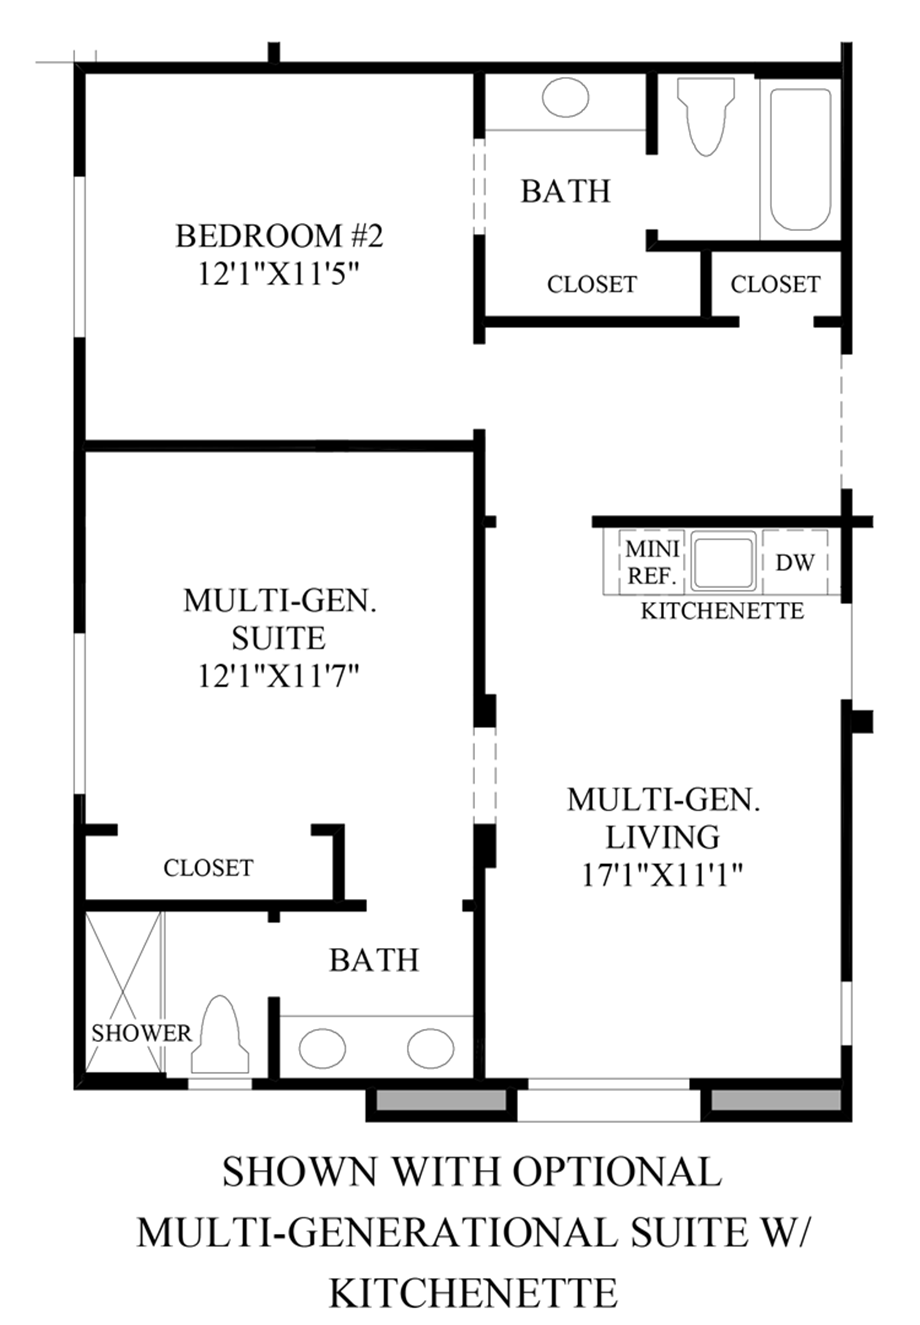 Optional Multi-Generational Suite w/ Kitchenette Floor Plan